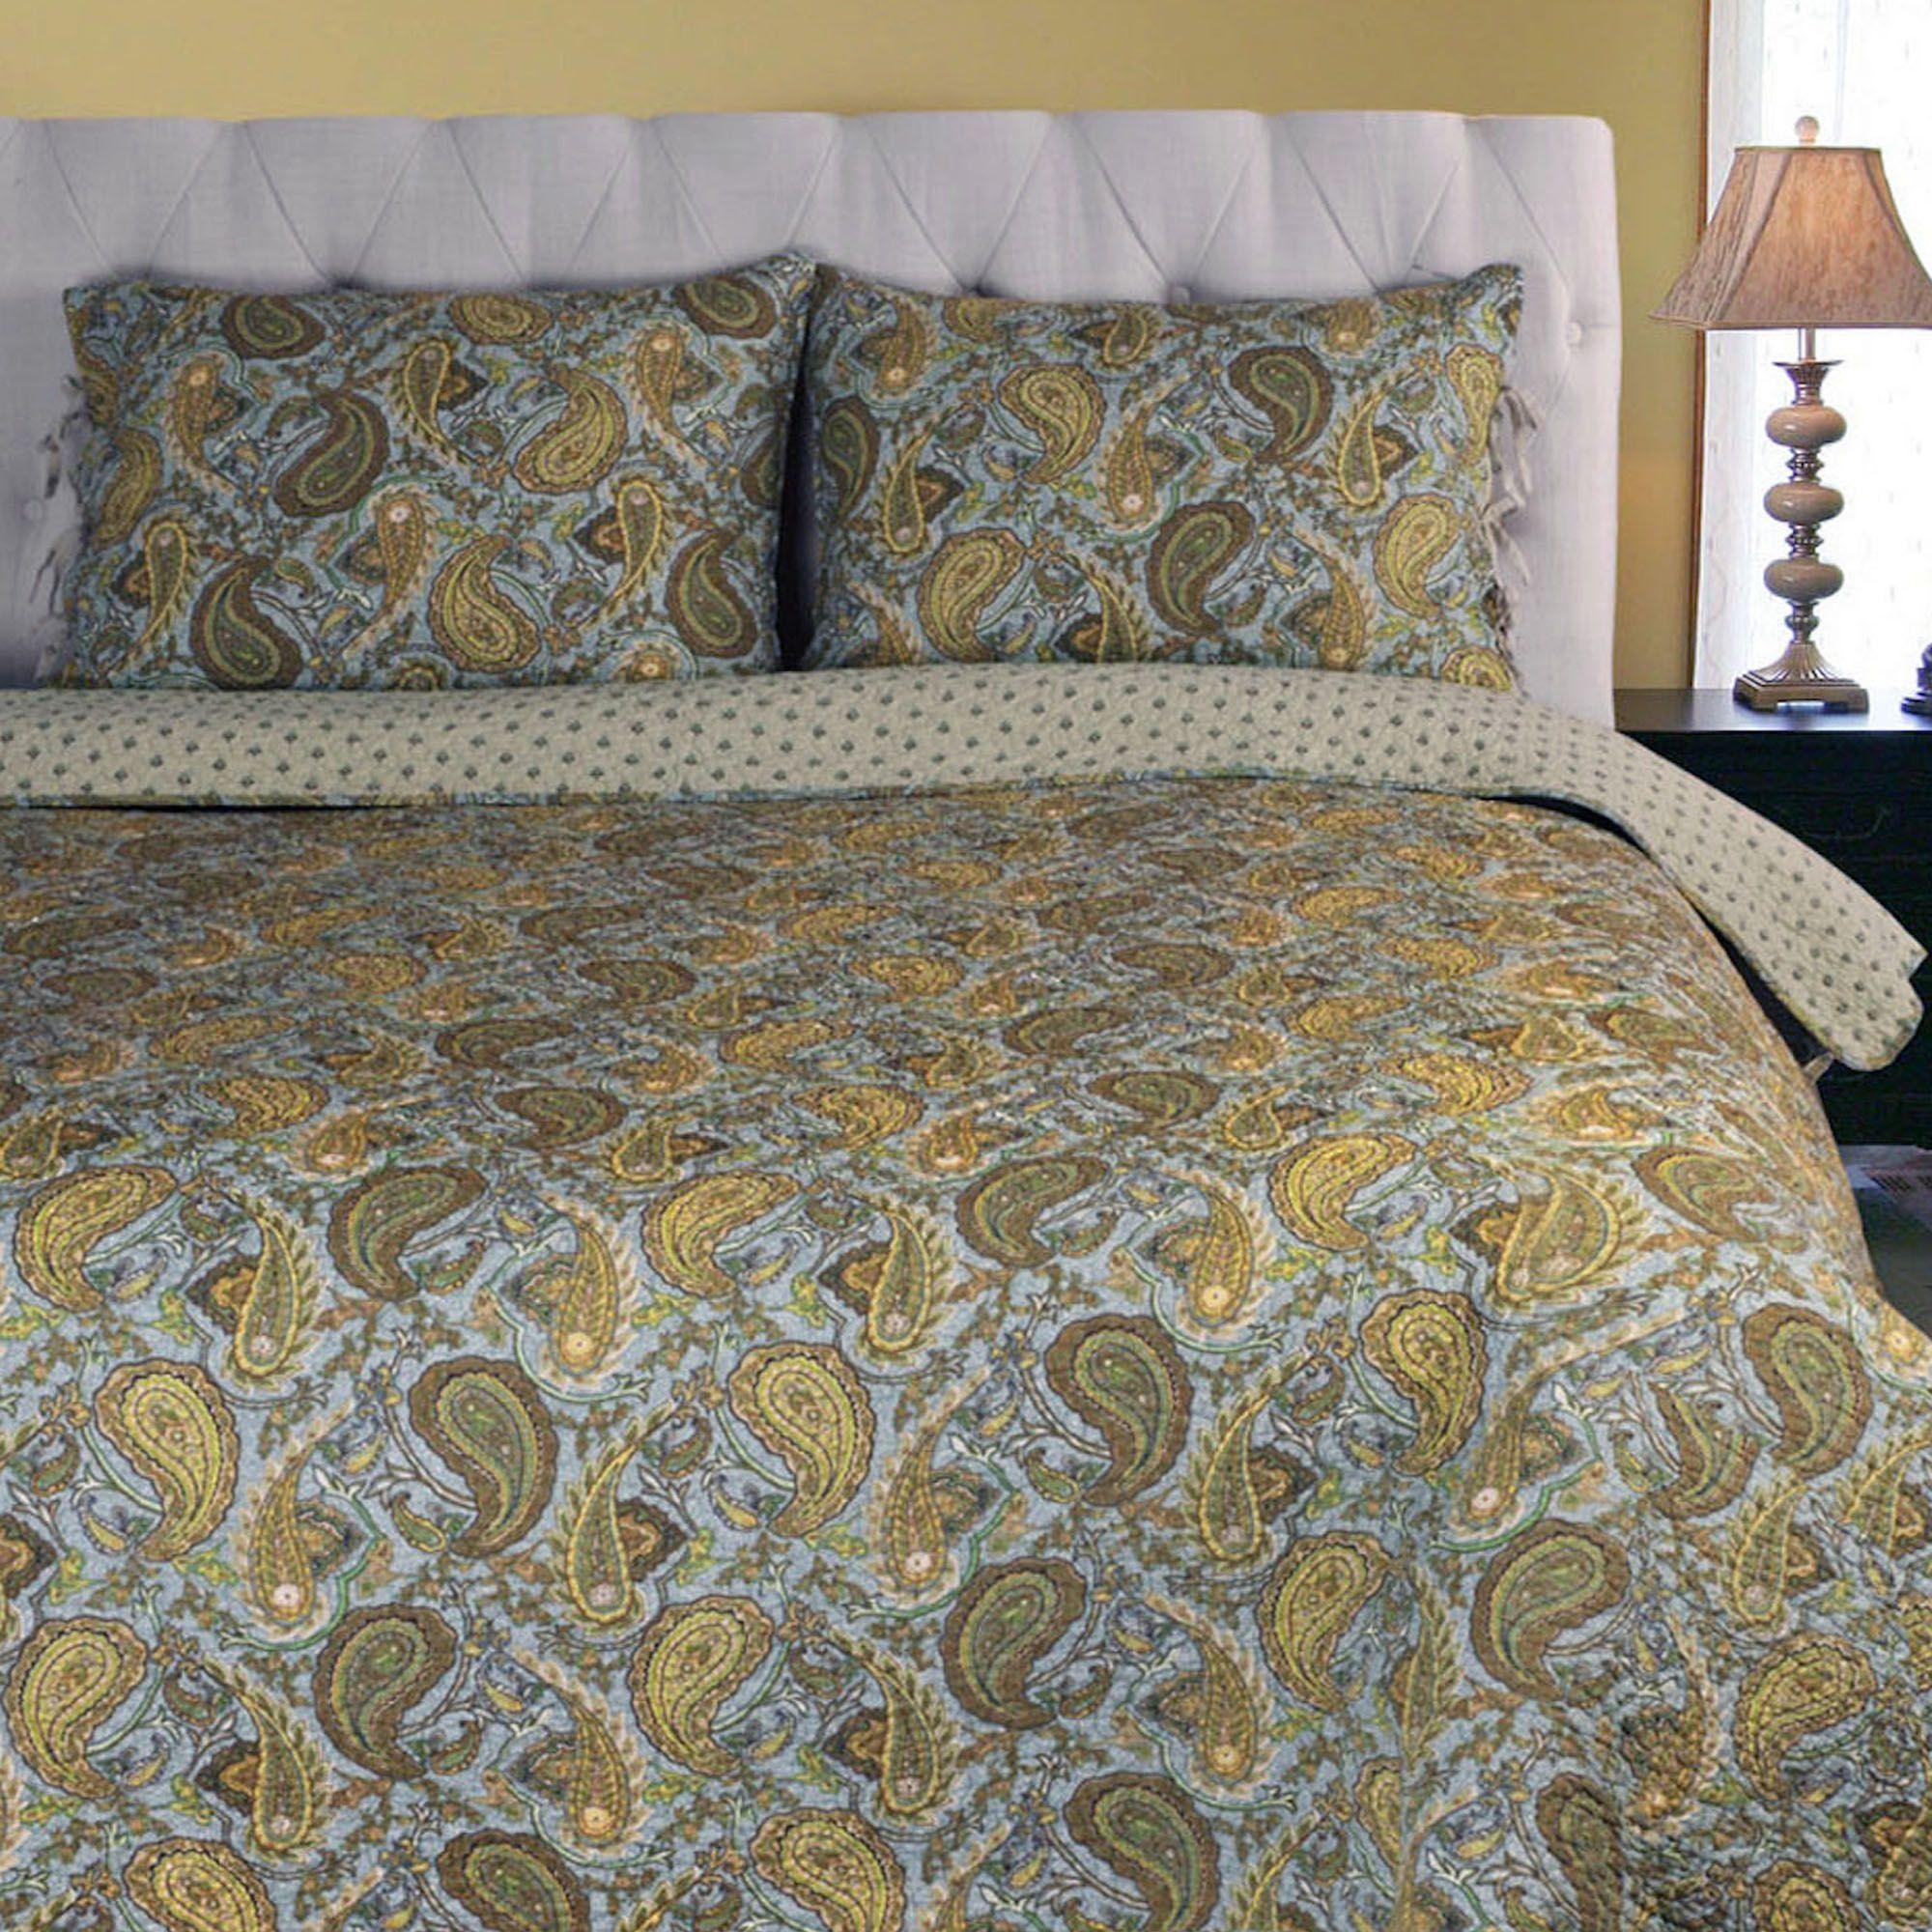 quilt taupe quilts p set piedmont light paisley comforter bedding